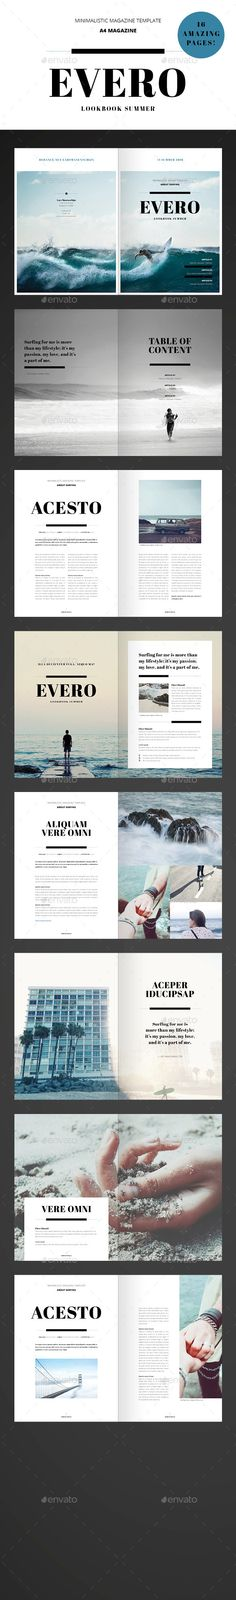 Amazing Minimal Magazine - InDesign Template #design Download: http://graphicriver.net/item/amazing-minimal-magazine-indesign-template-/11957652?ref=ksioks